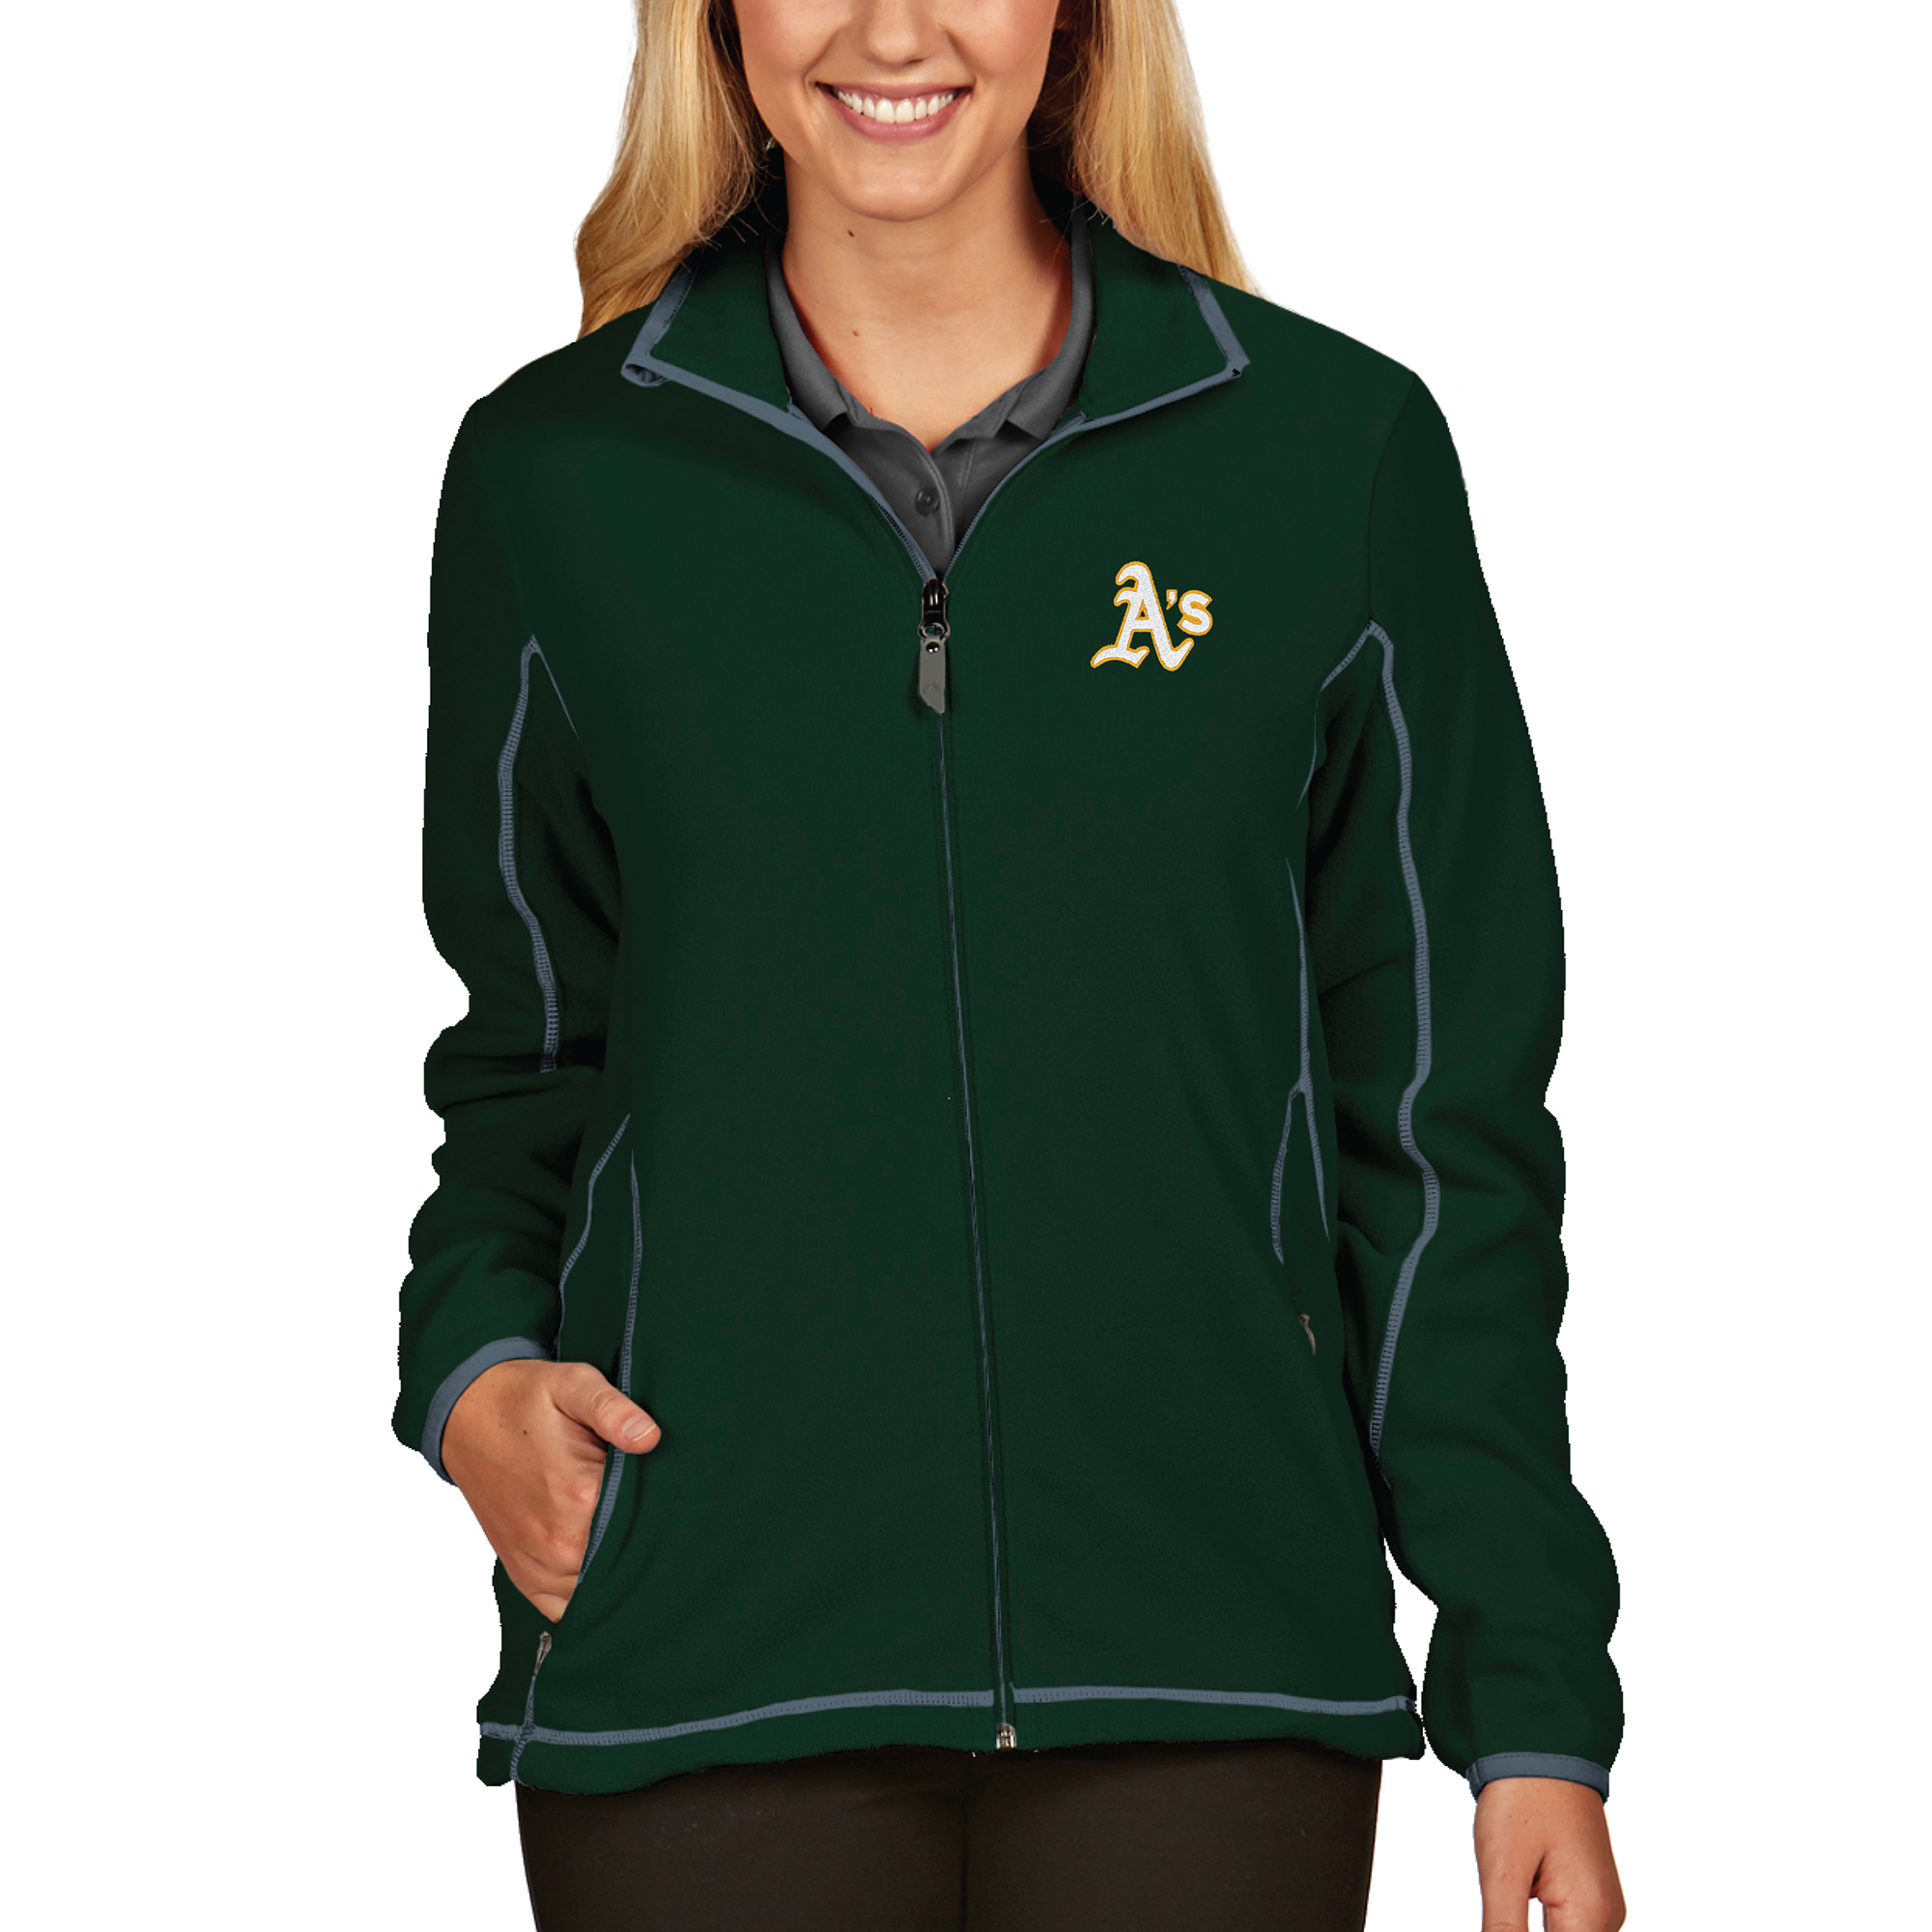 Oakland Athletics Antigua Women's Full Zip Ice Jacket - Green